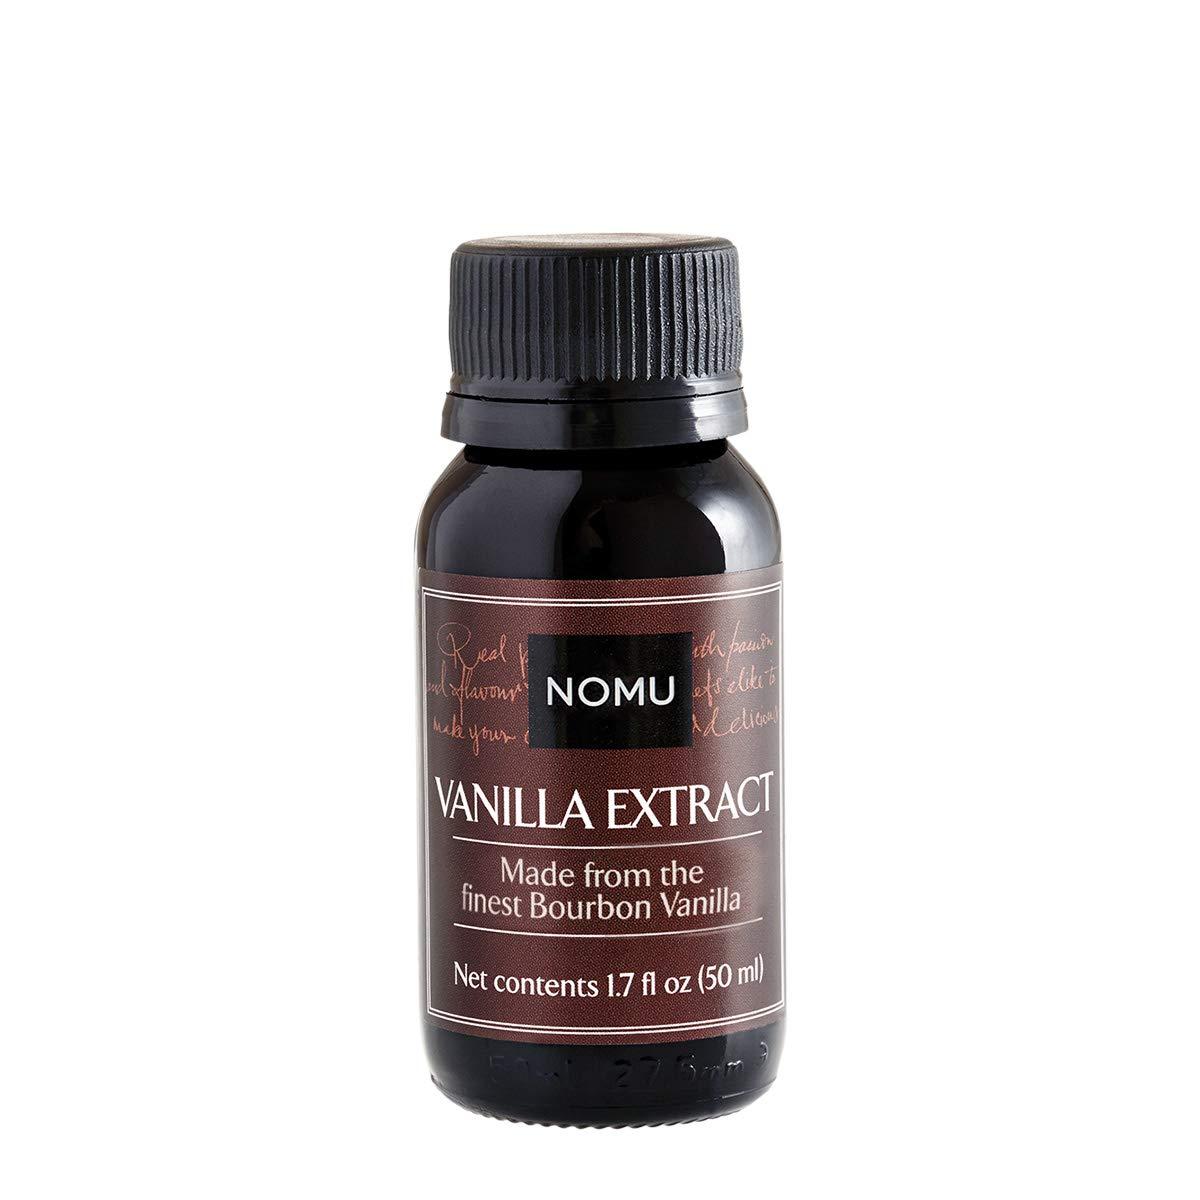 NOMU Vanilla Extract | Made with Bourbon Vanilla Beans (50ml)